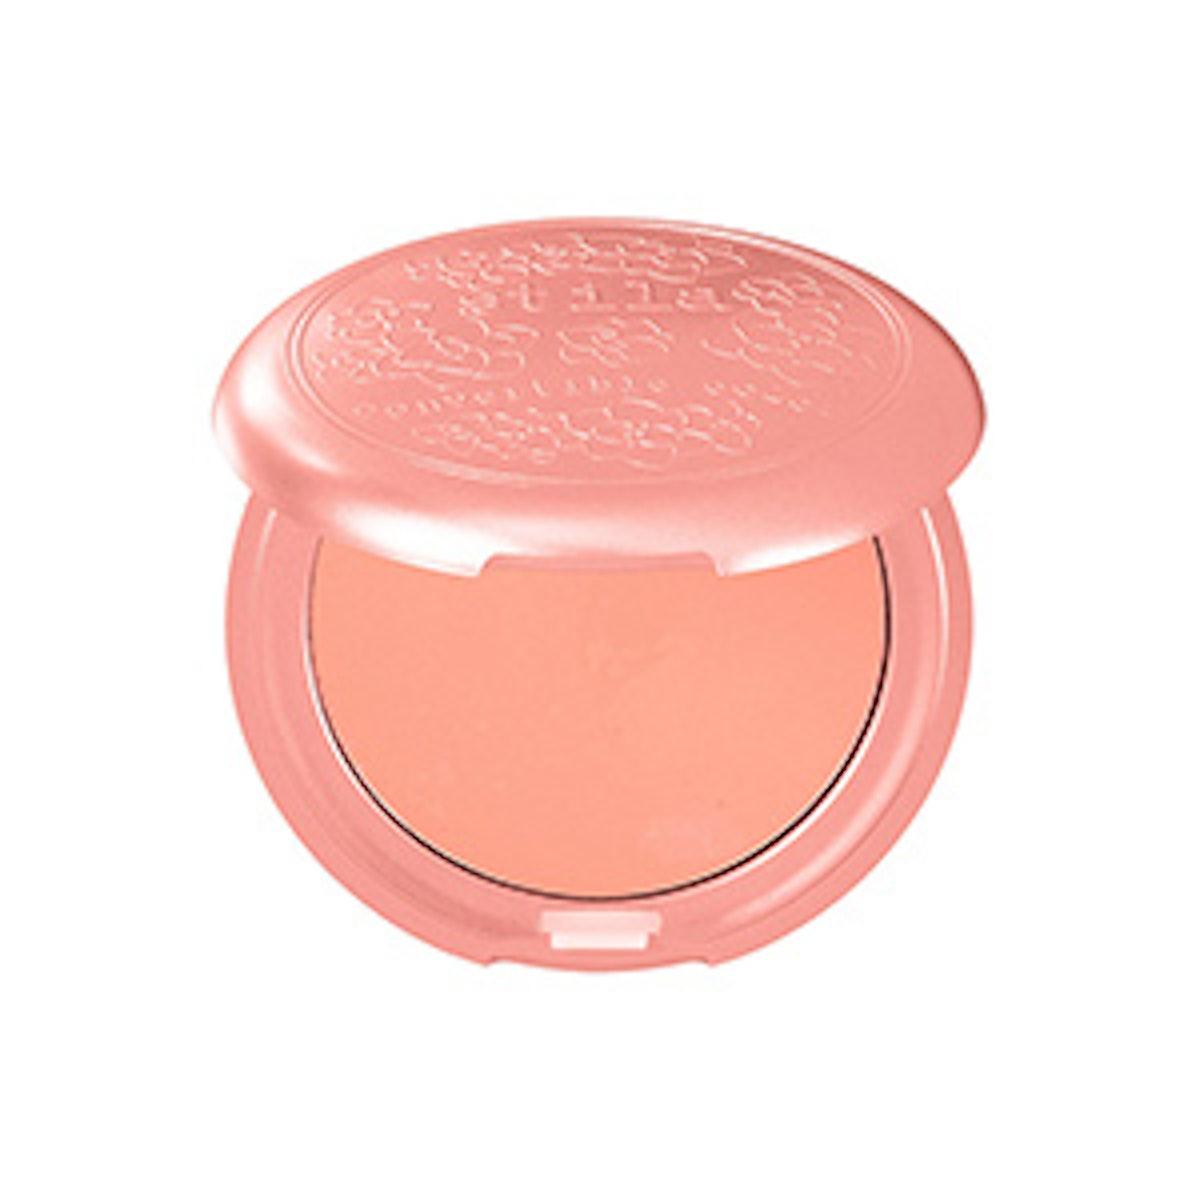 Convertible Color Dual Lip & Cheek Cream in Lillium